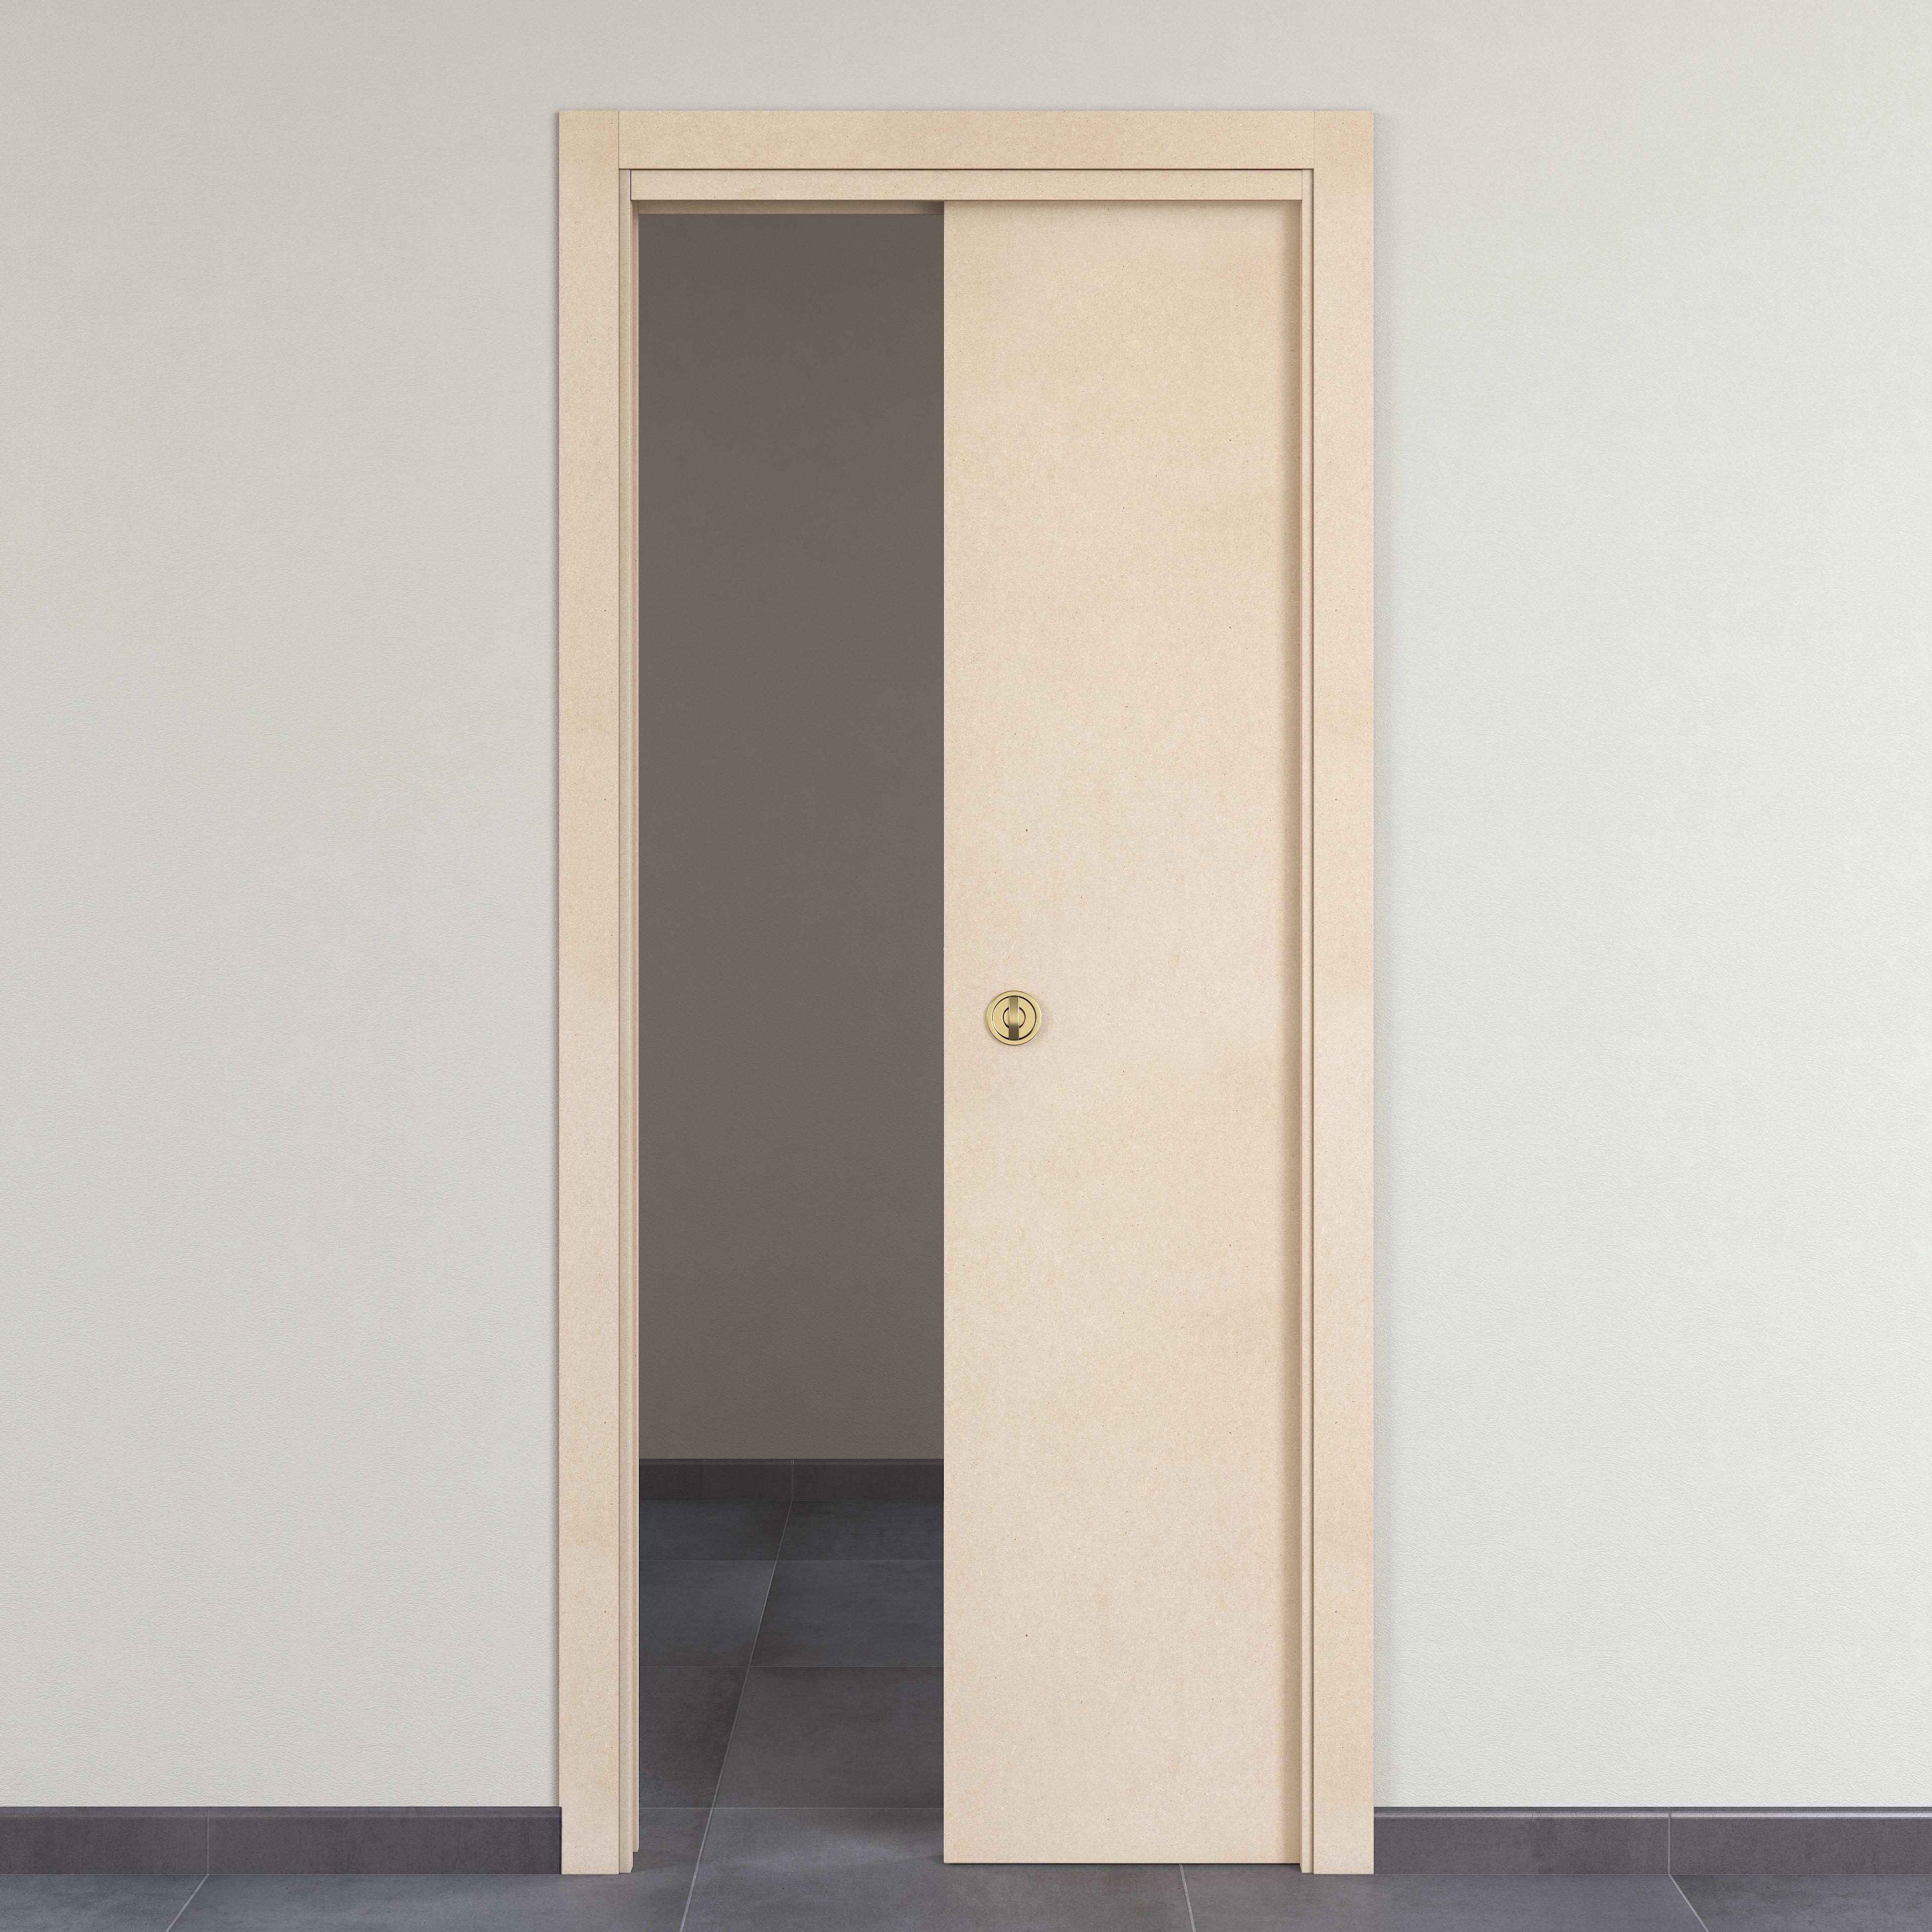 Porta Scrigno 60 Cm porta scorrevole a scomparsa saint germain naturale l 60 x h 210 cm  reversibile